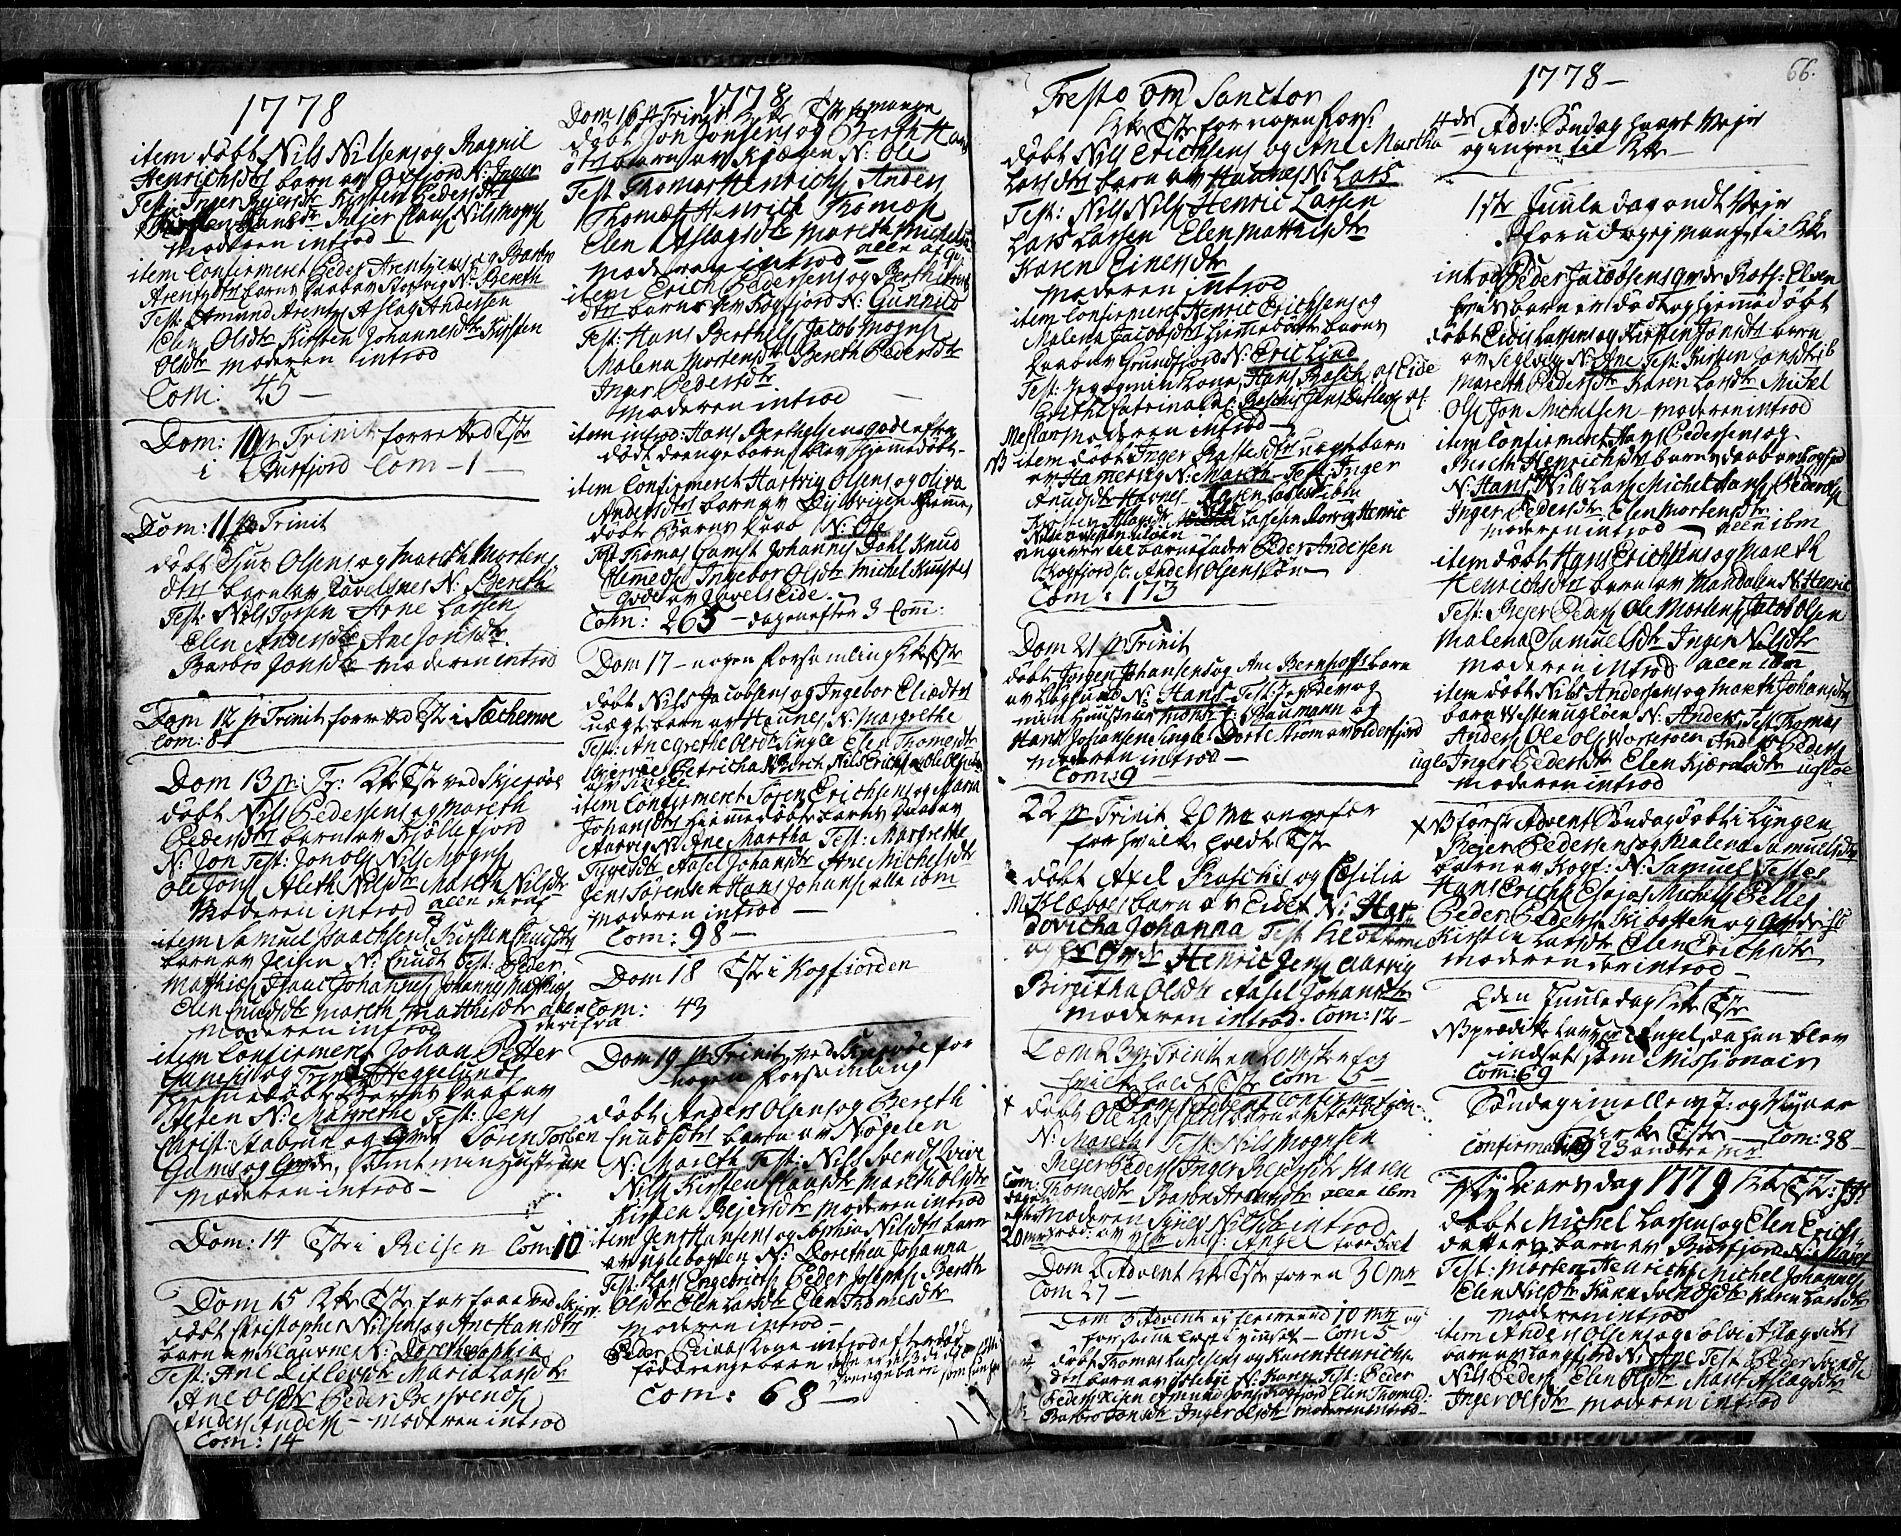 SATØ, Skjervøy sokneprestkontor, H/Ha/Haa/L0001kirke: Ministerialbok nr. 1, 1748-1780, s. 66